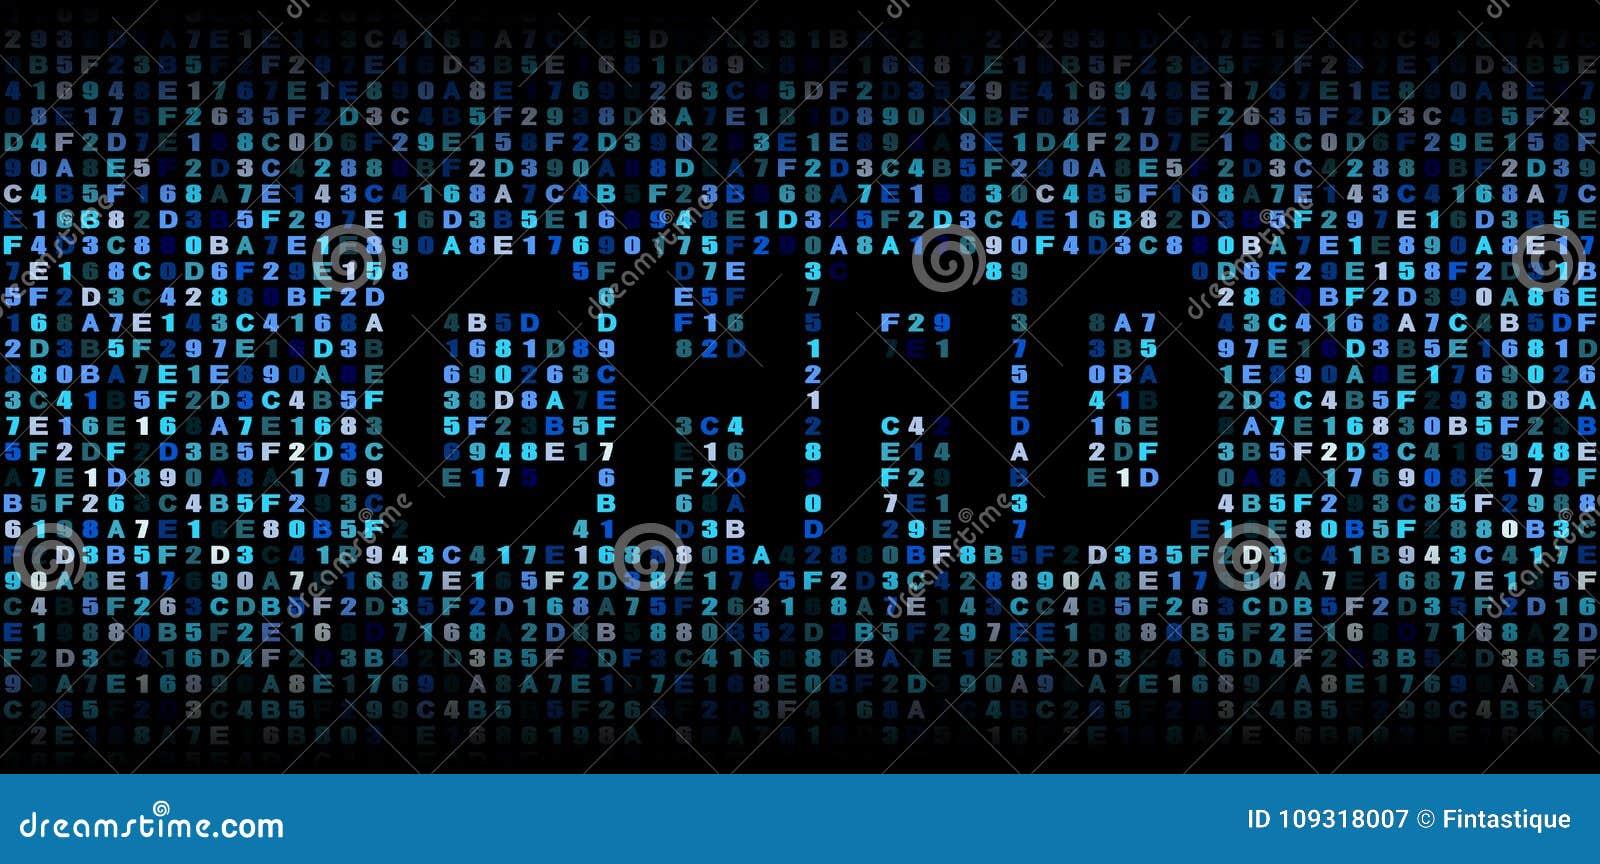 Chad Text On Hex Code Illustration Stock Illustration - Illustration